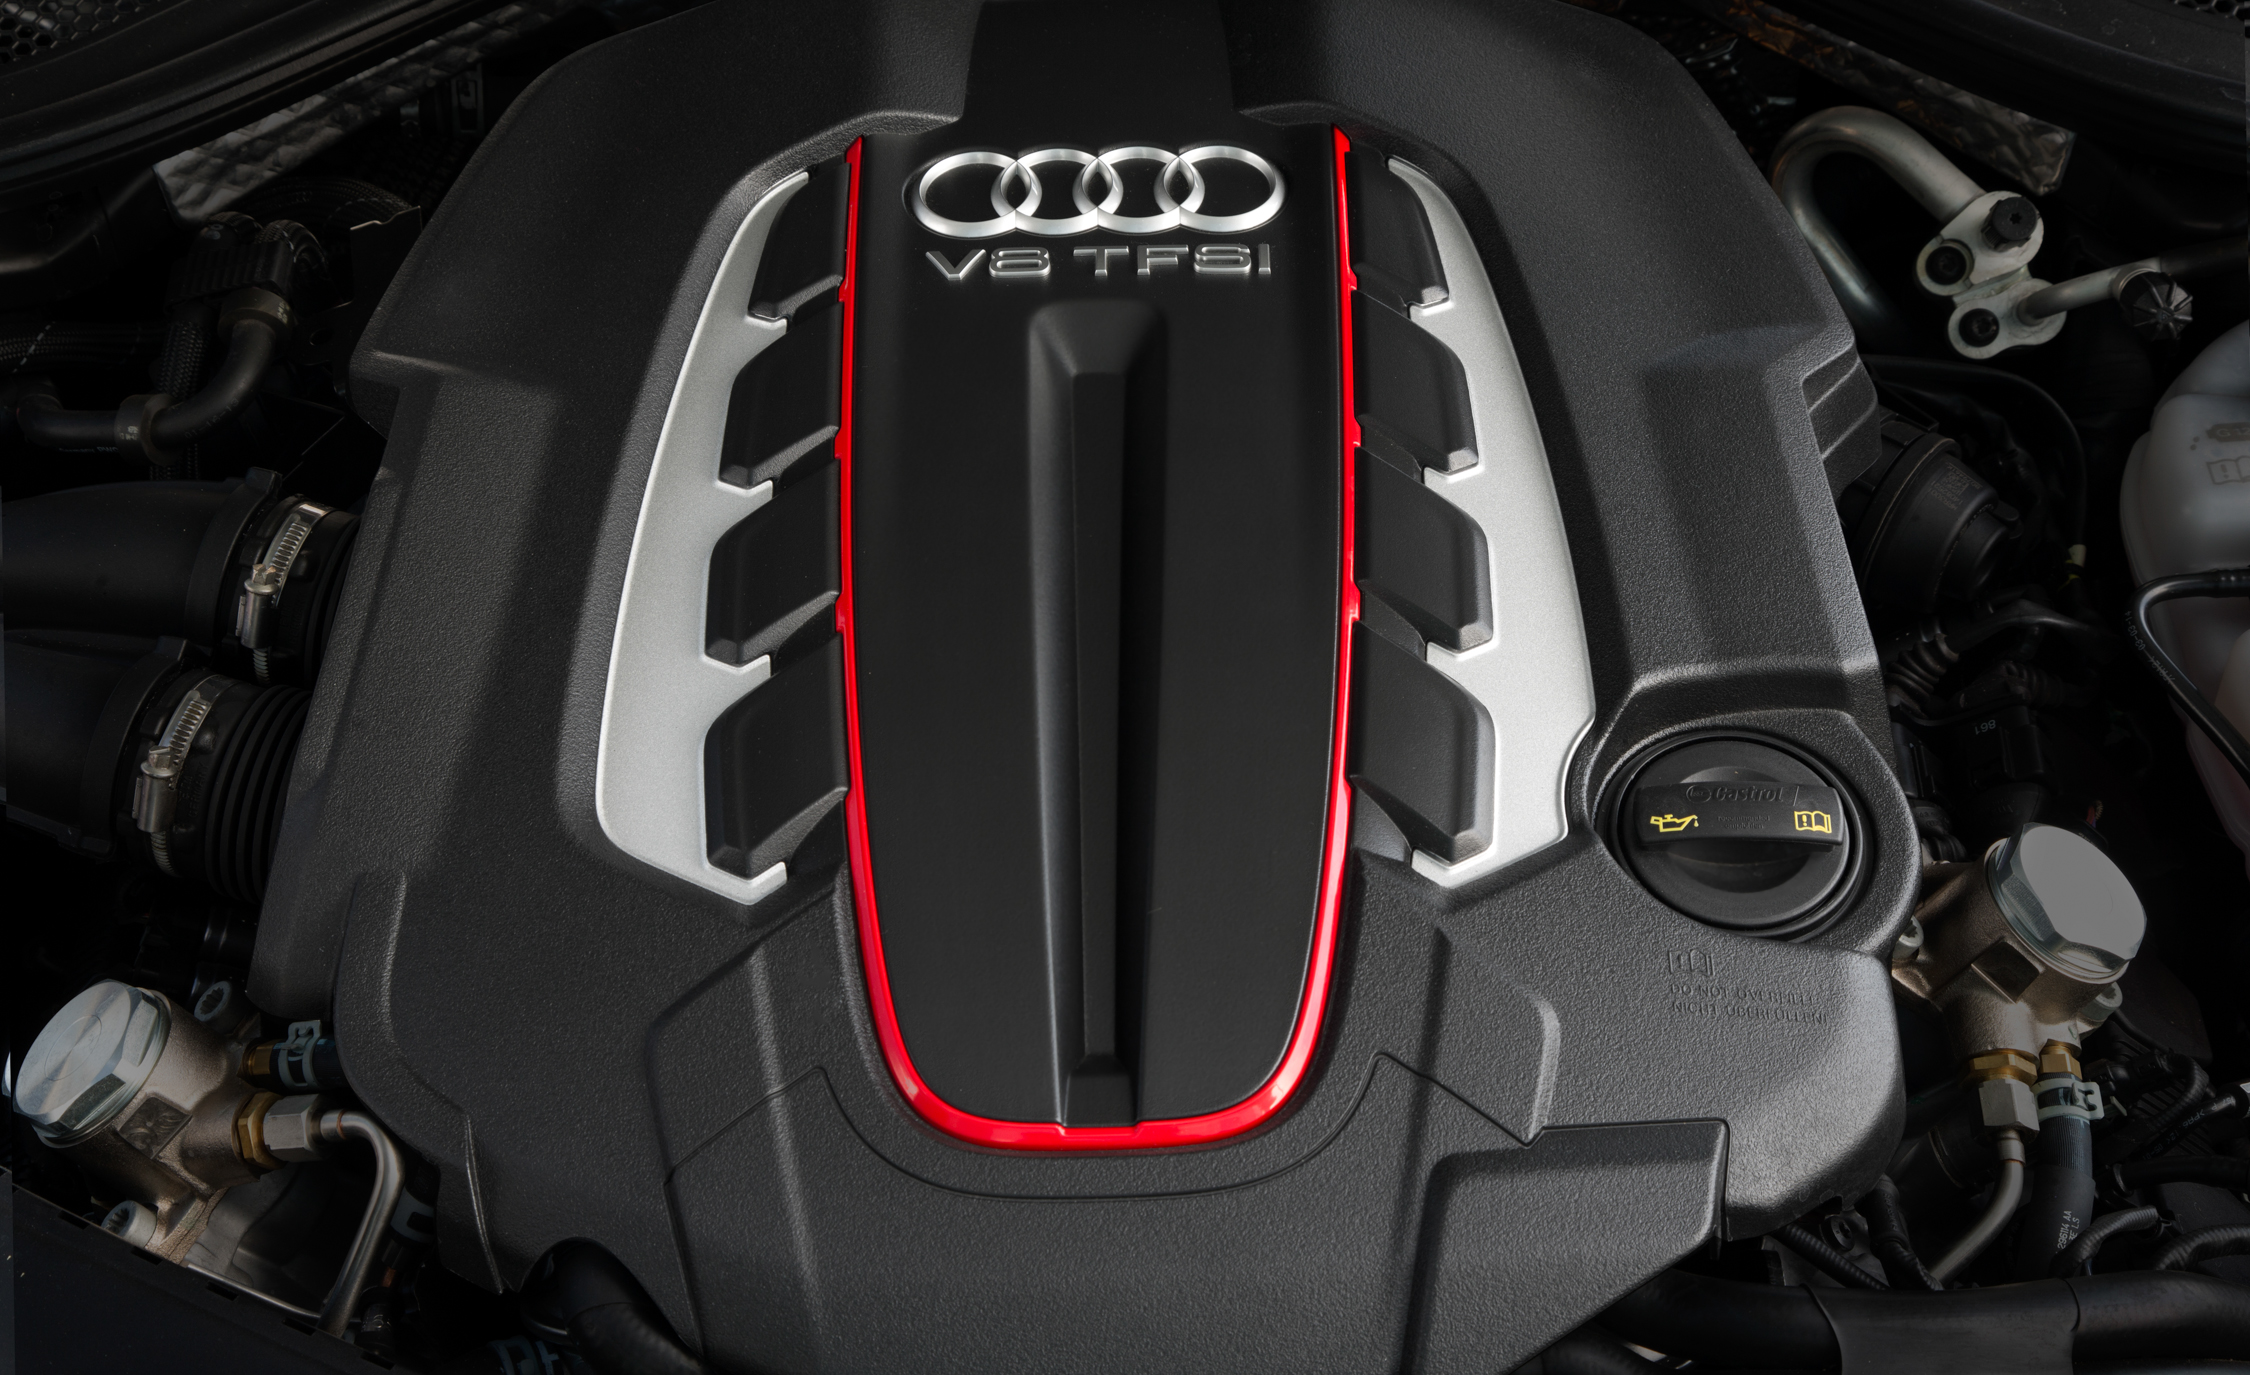 New 2016 Audi S7 Twin-Turbocharged 4.0-Liter V-8 Engine